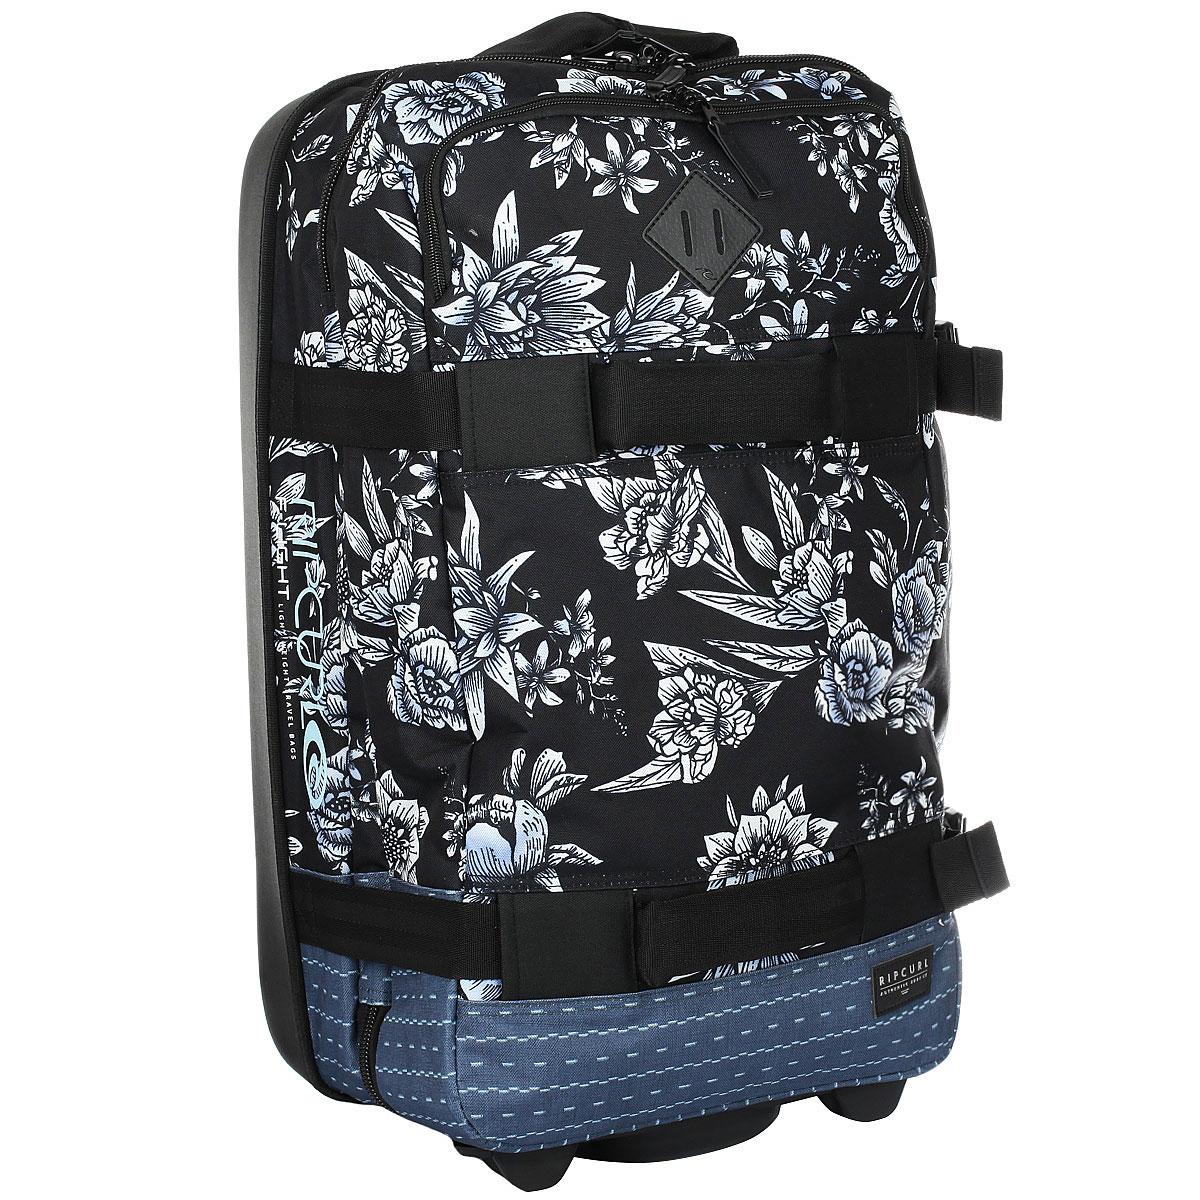 0b7bad02862e Купить сумку дорожная женскую Rip Curl Zephyr Transit Black (LTRDE4 ...